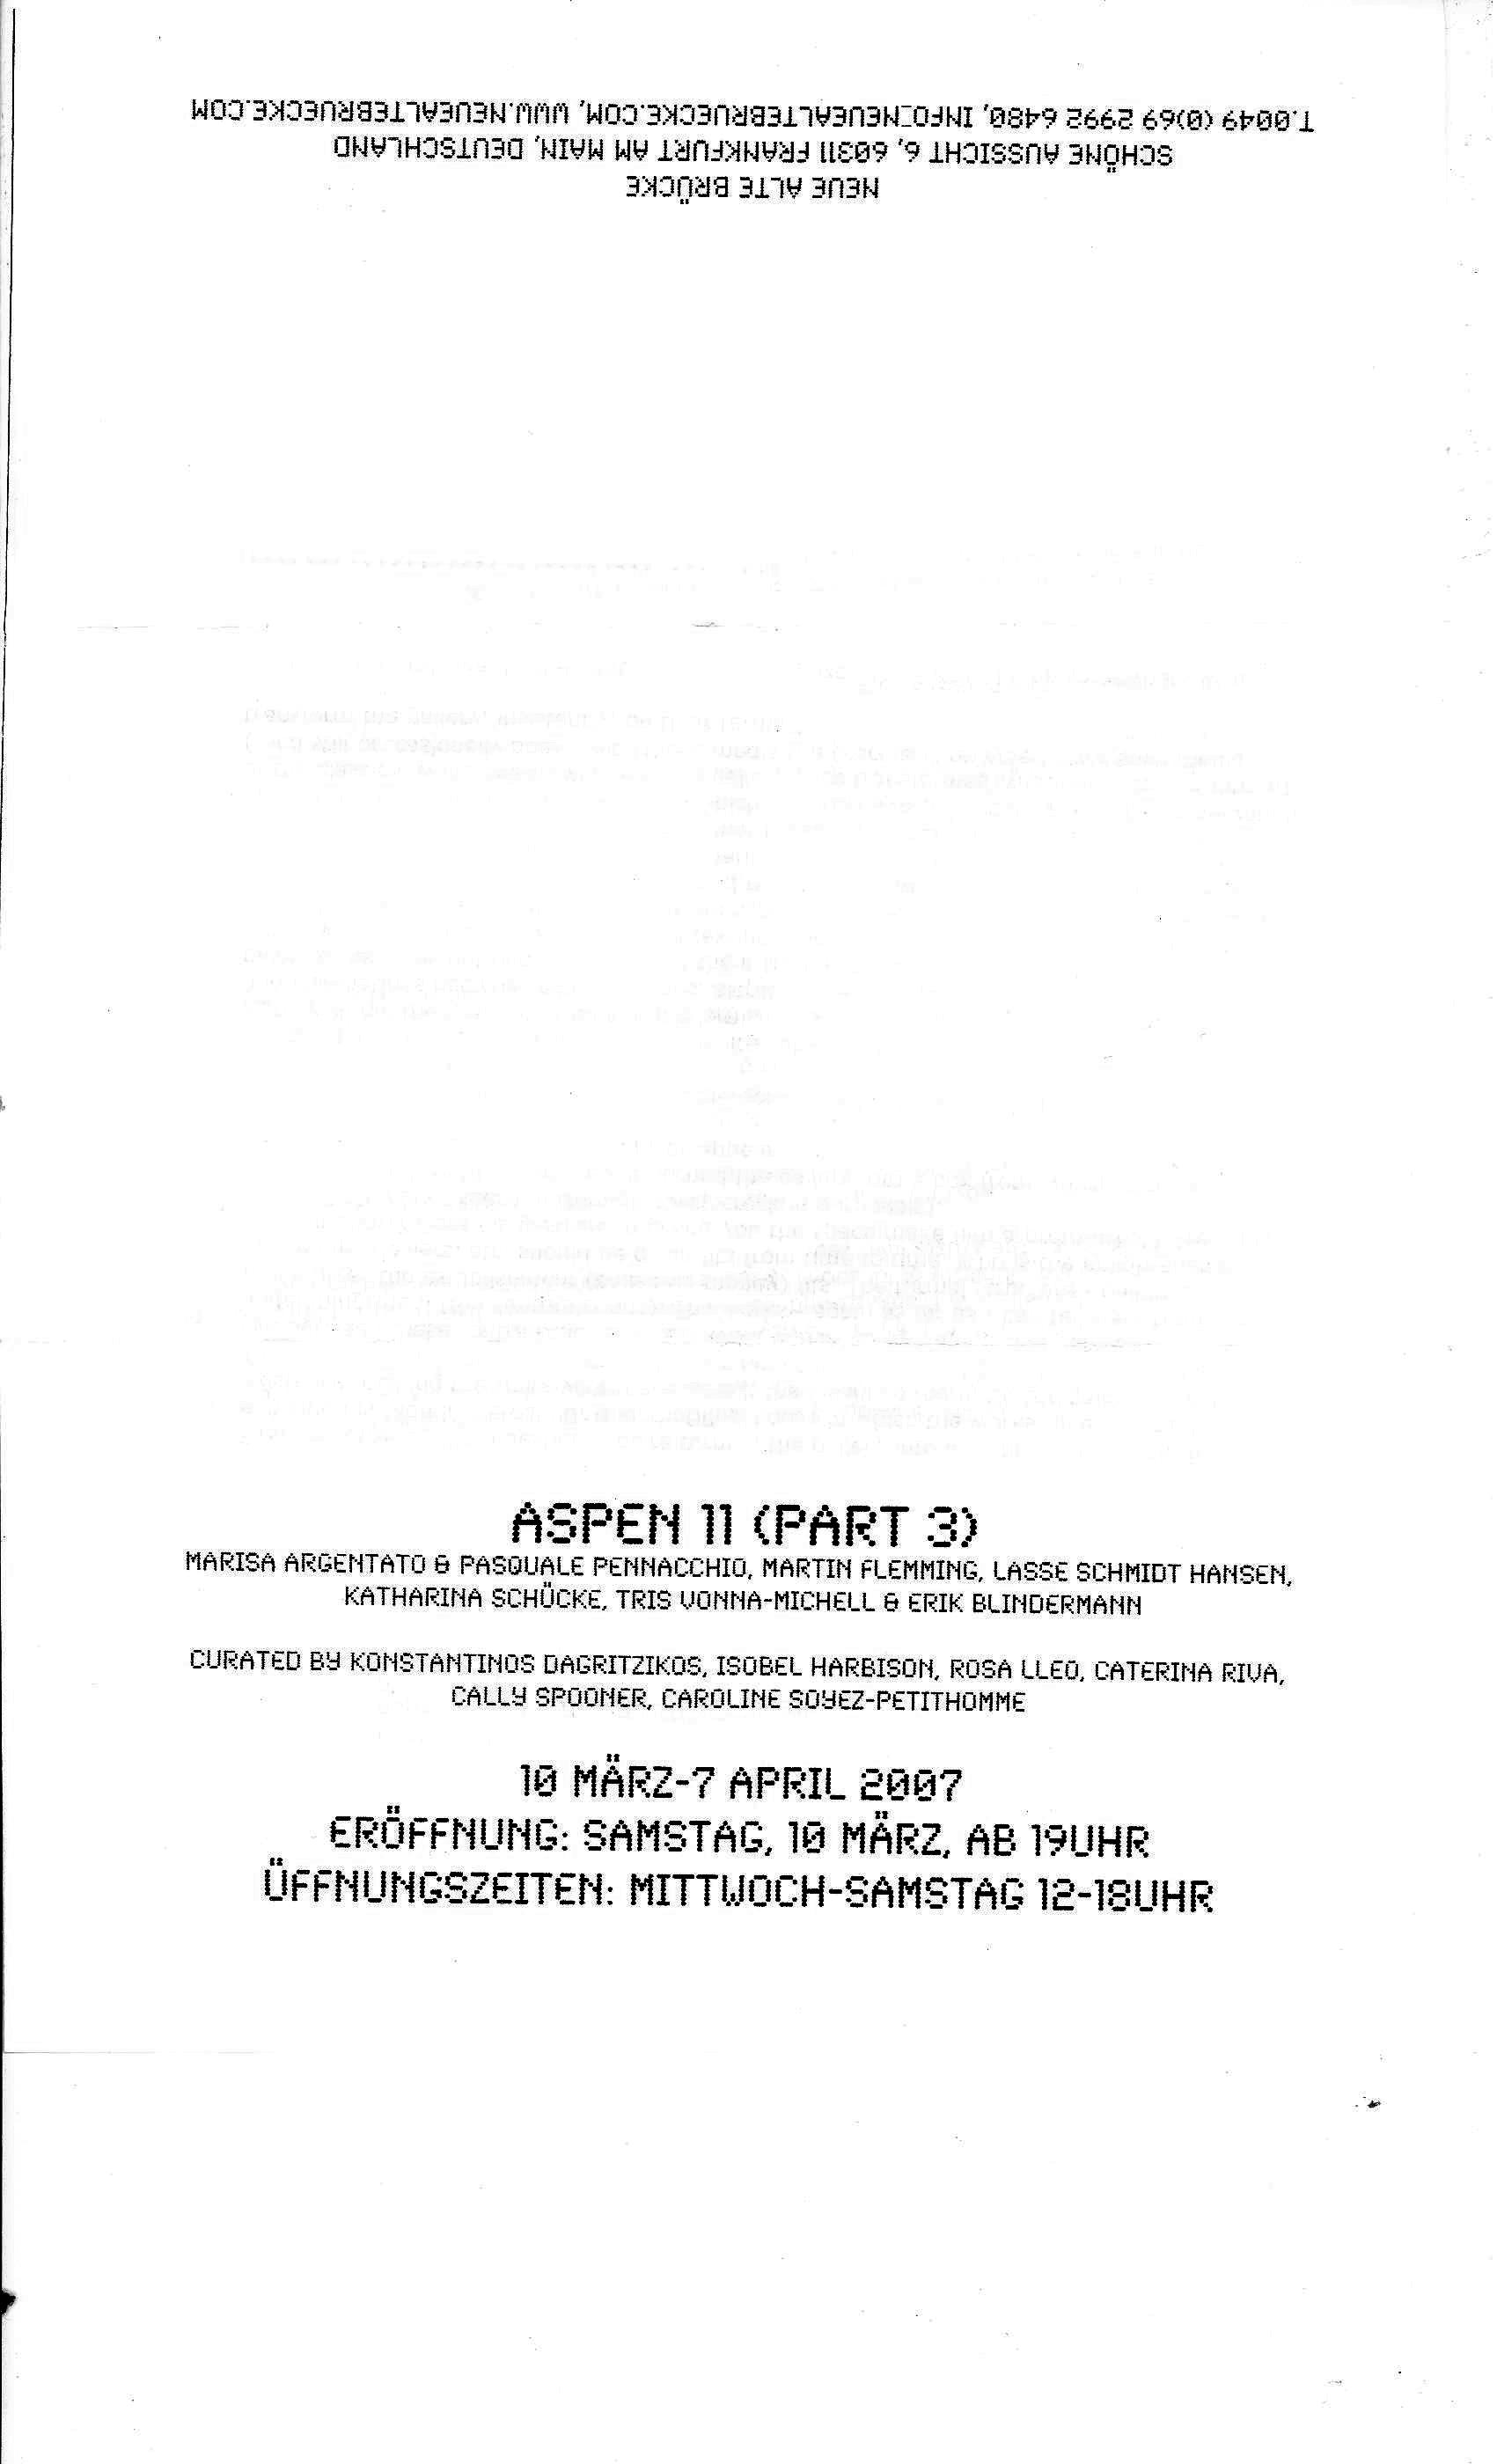 Aspen 11, part 3.pdf